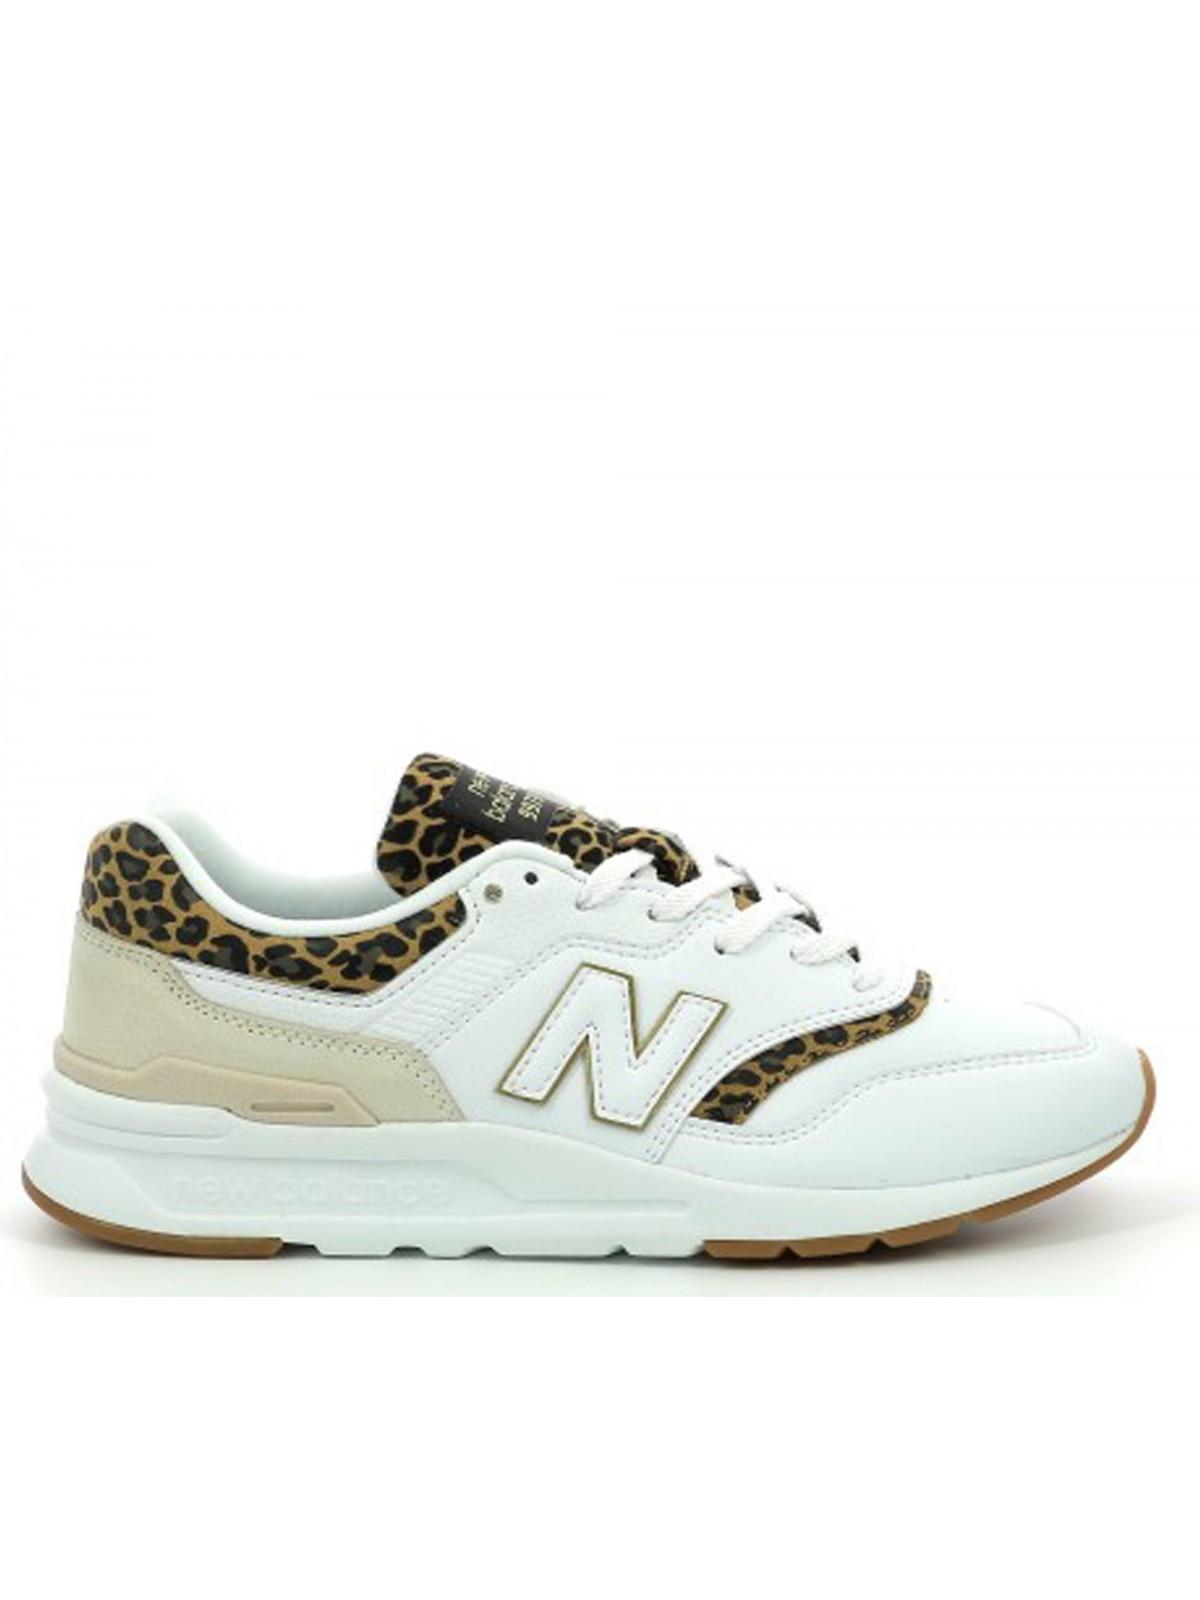 New Balance CW997 cuir blanc / léopard